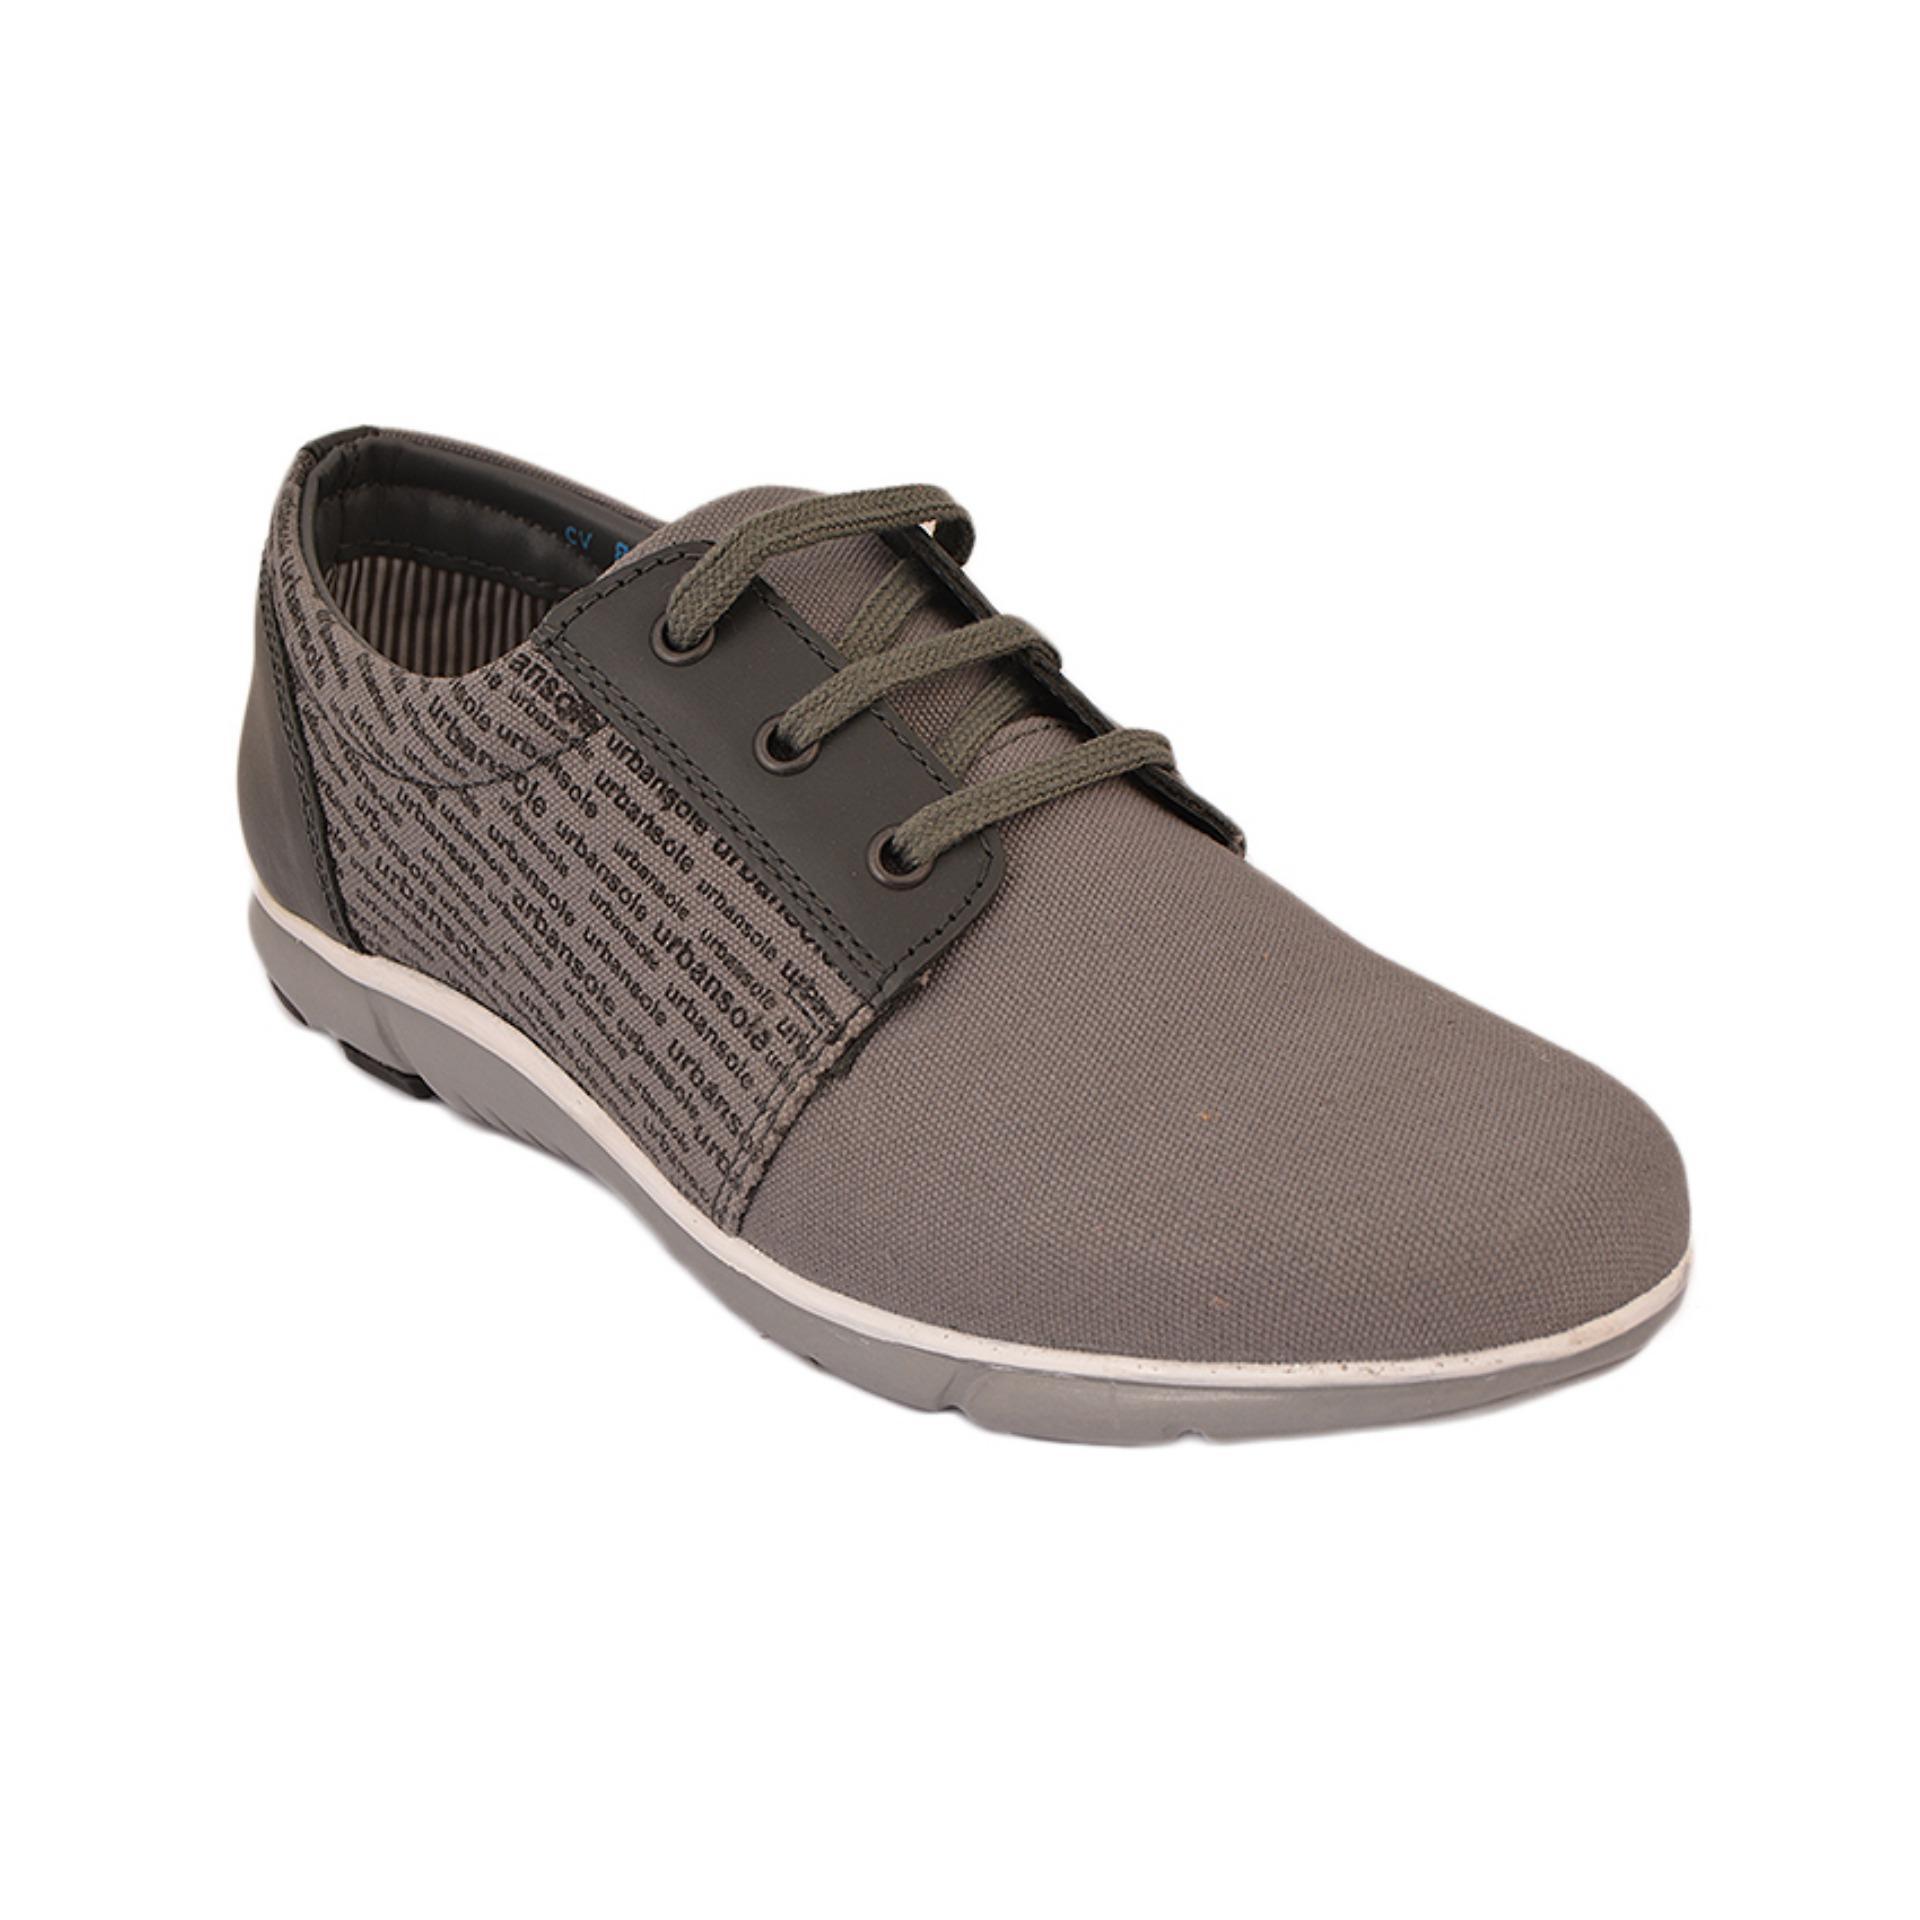 Urban Sole Grey Canvas Shoes Winter Collection - Cv-8101